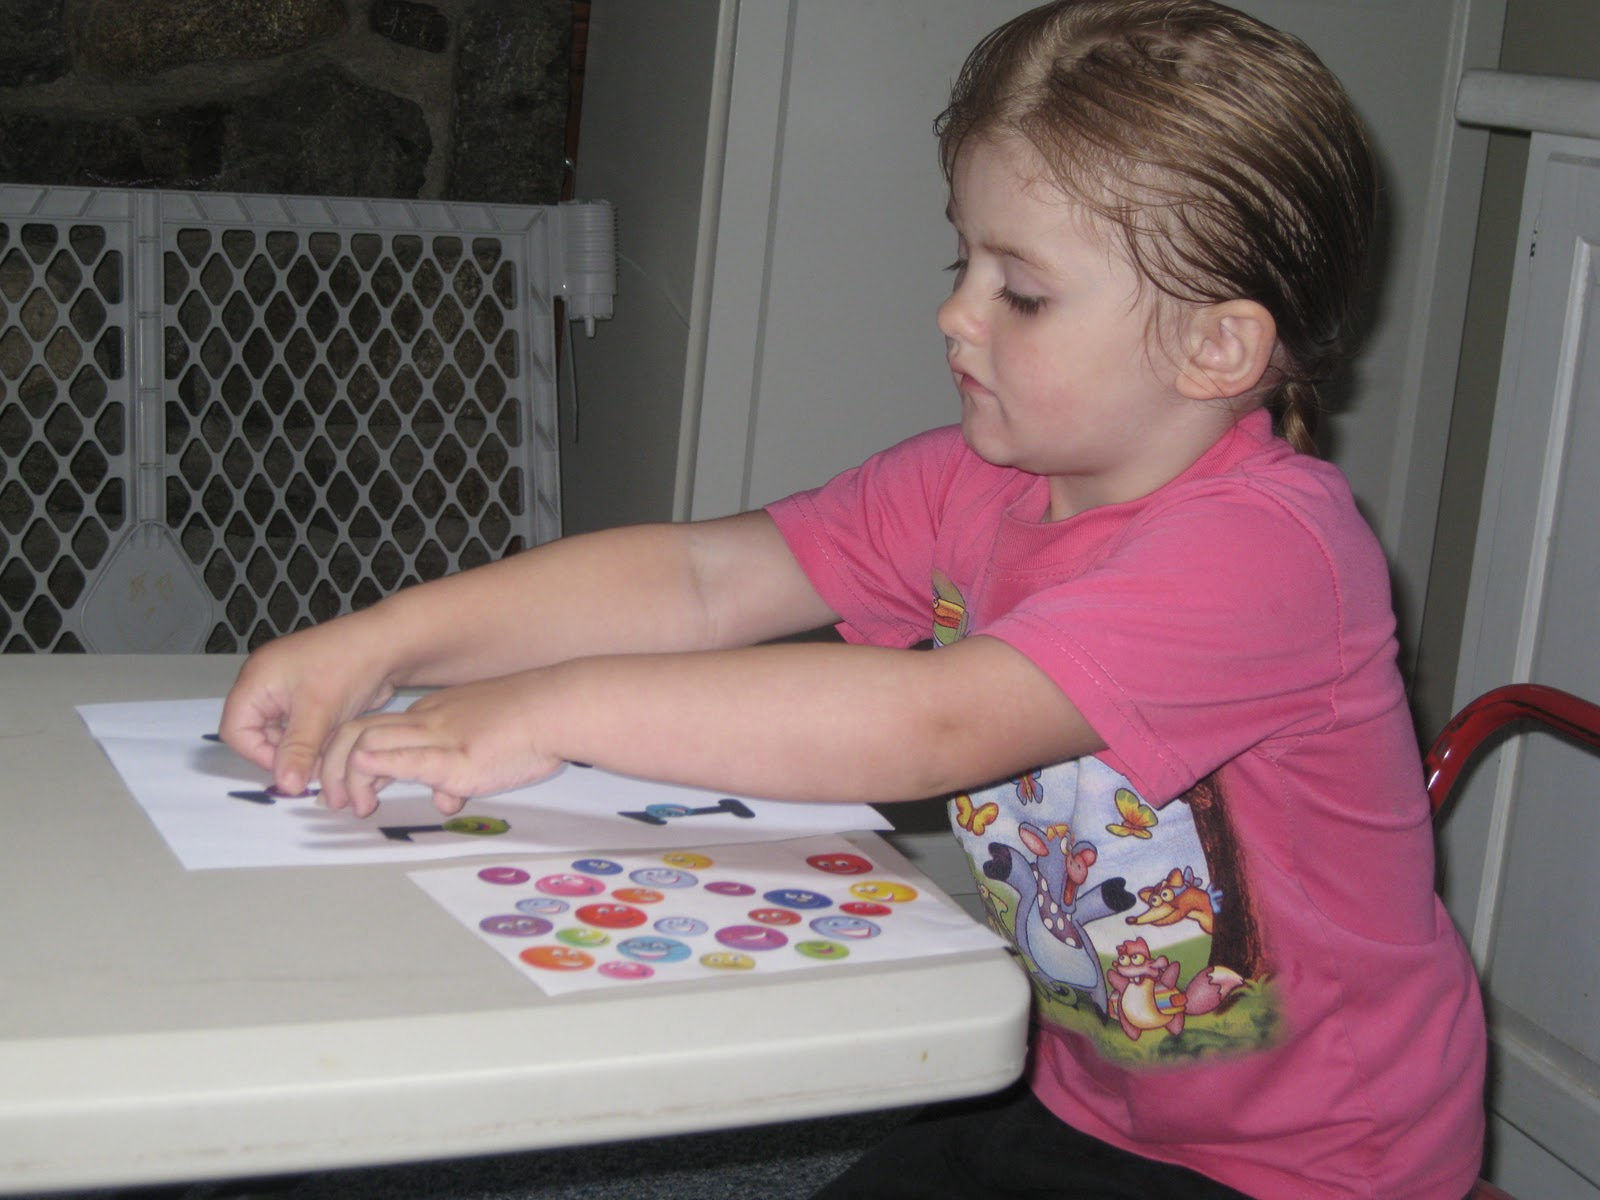 Dottie S Homeschool Universe Weekly Wrap Up 9 6